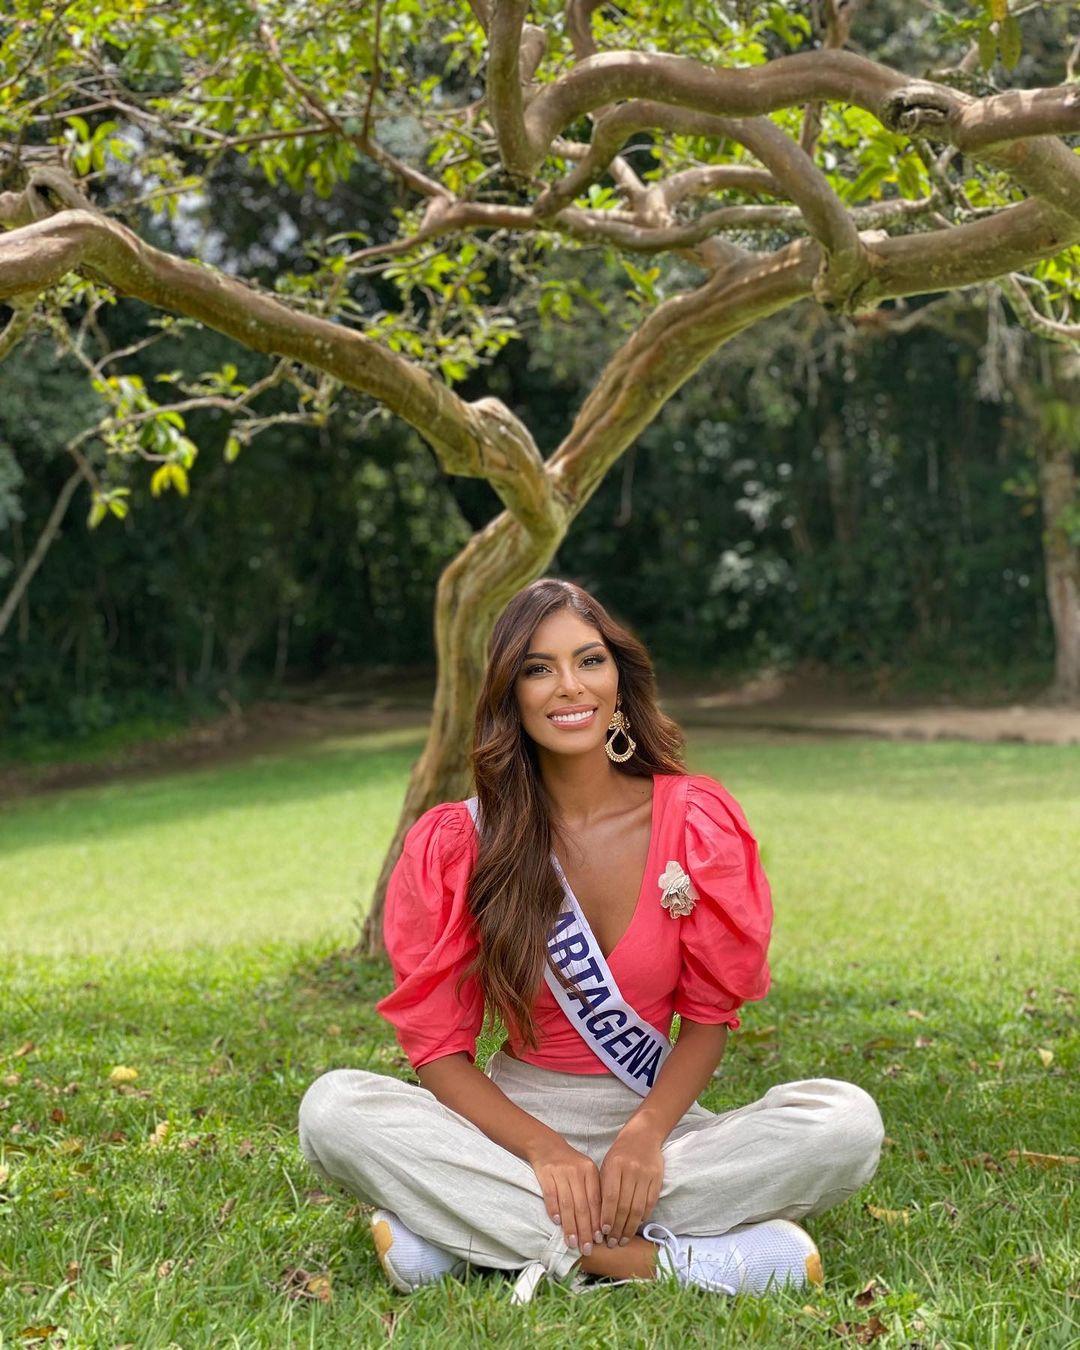 valeria ayos bossa, miss universe colombia 2021/miss water earth 2018. - Página 22 24146311